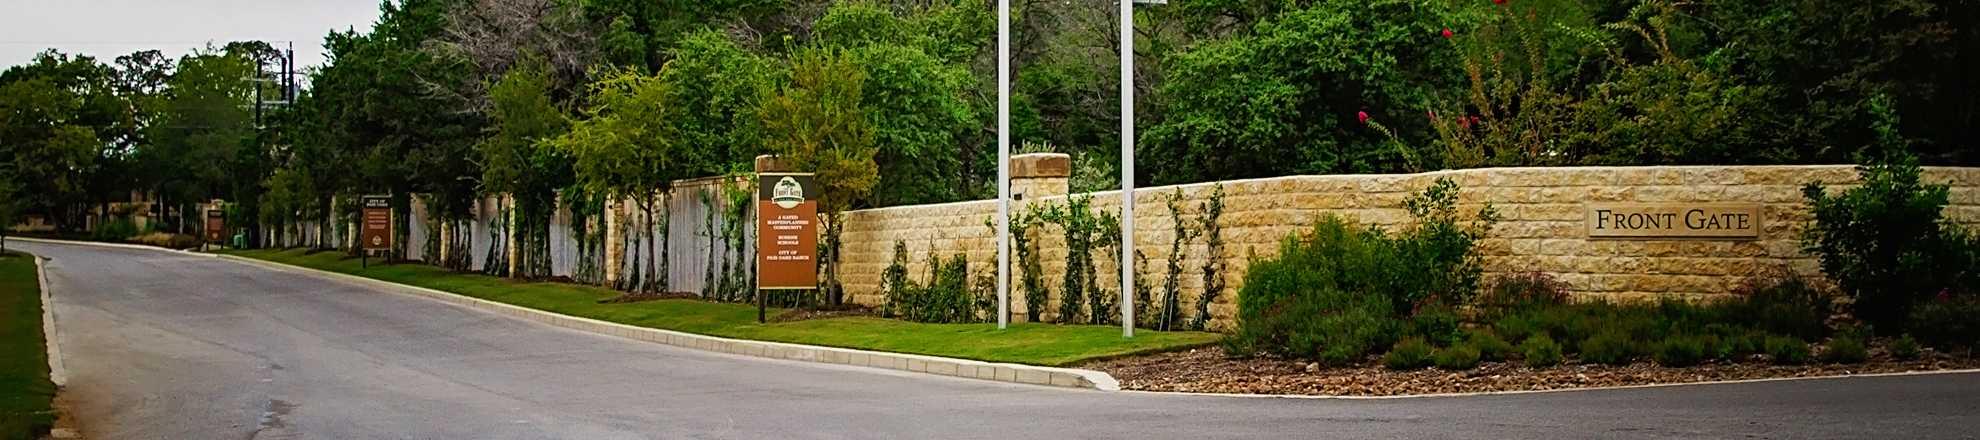 Model Home In San Antonio Texas Front Gate In Fair Oaks